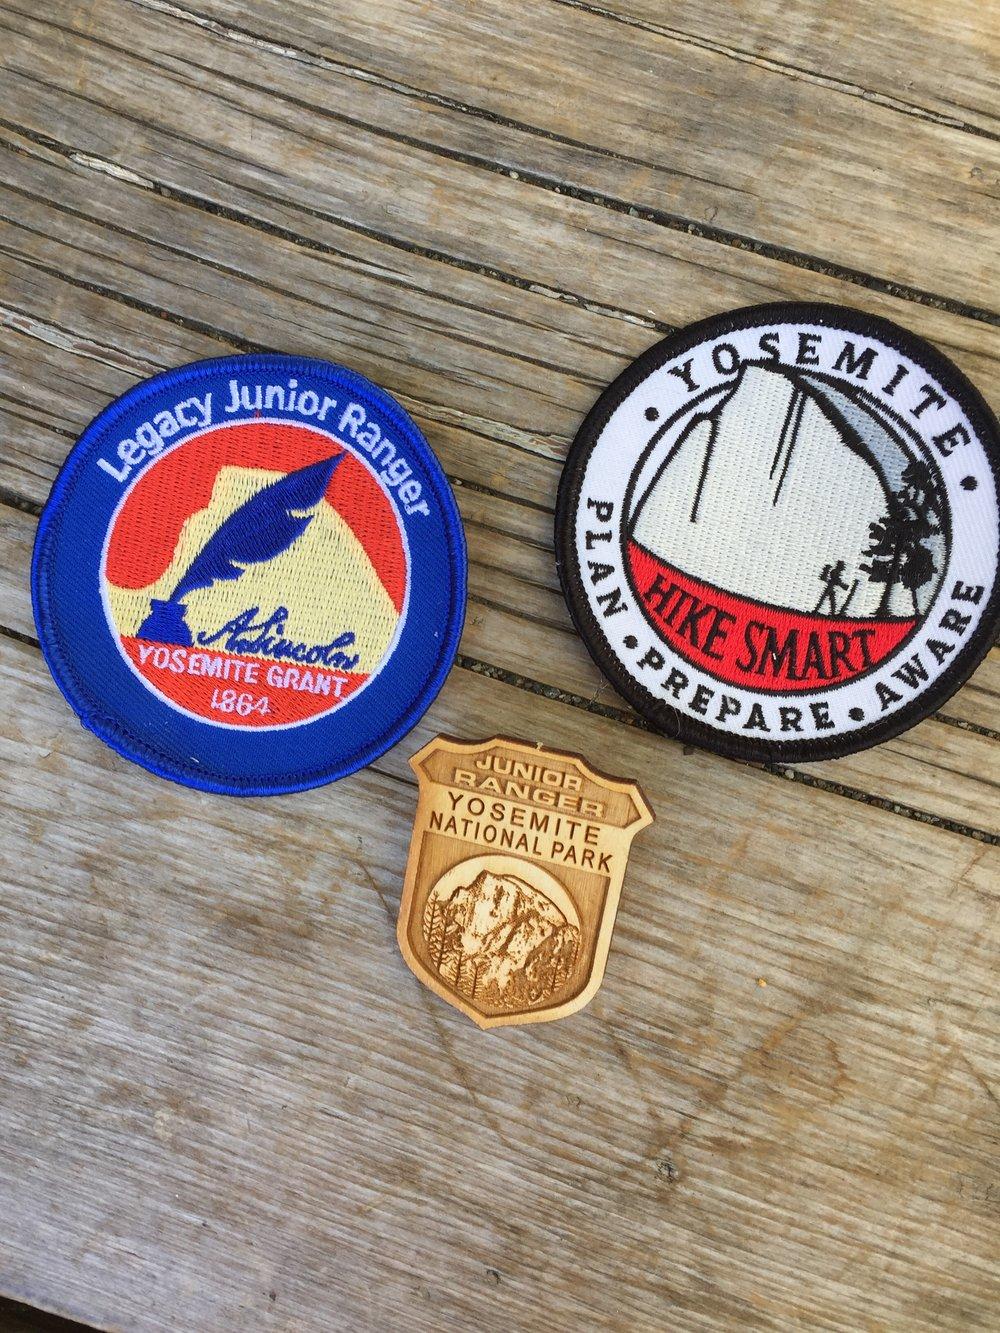 Junior Ranger badges